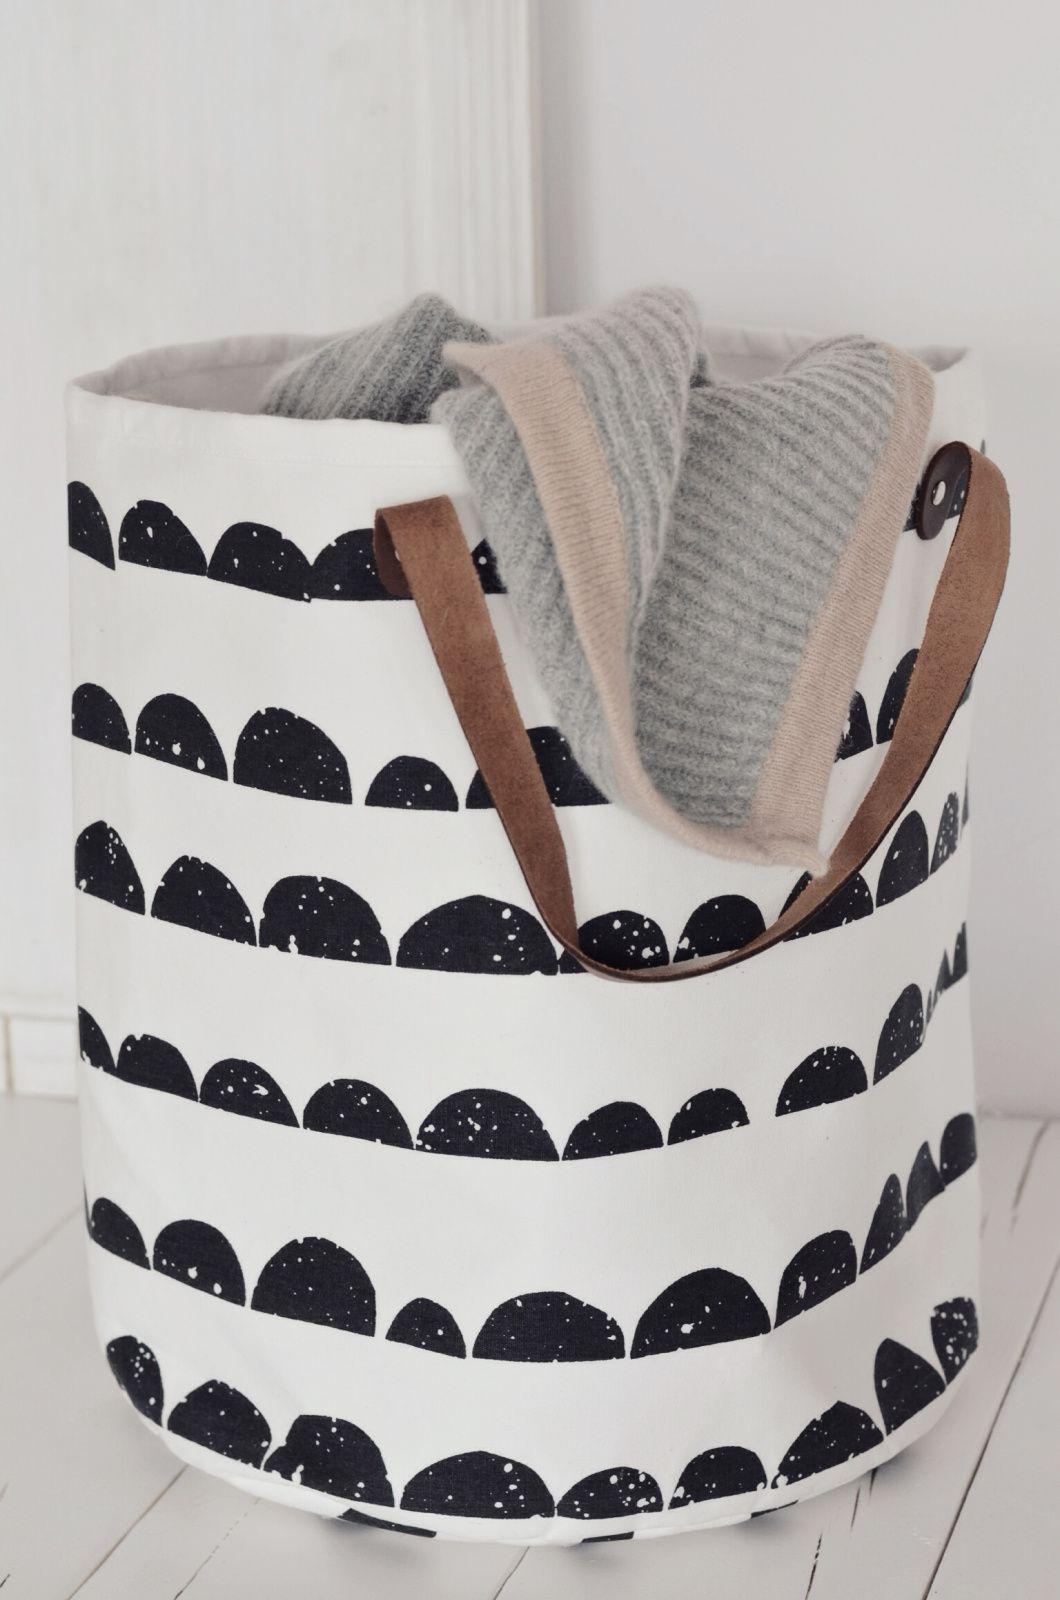 Diy laundry bag httpdesignlovefest201404make it 56 diy laundry bag httpdesignlovefest2014 solutioingenieria Choice Image